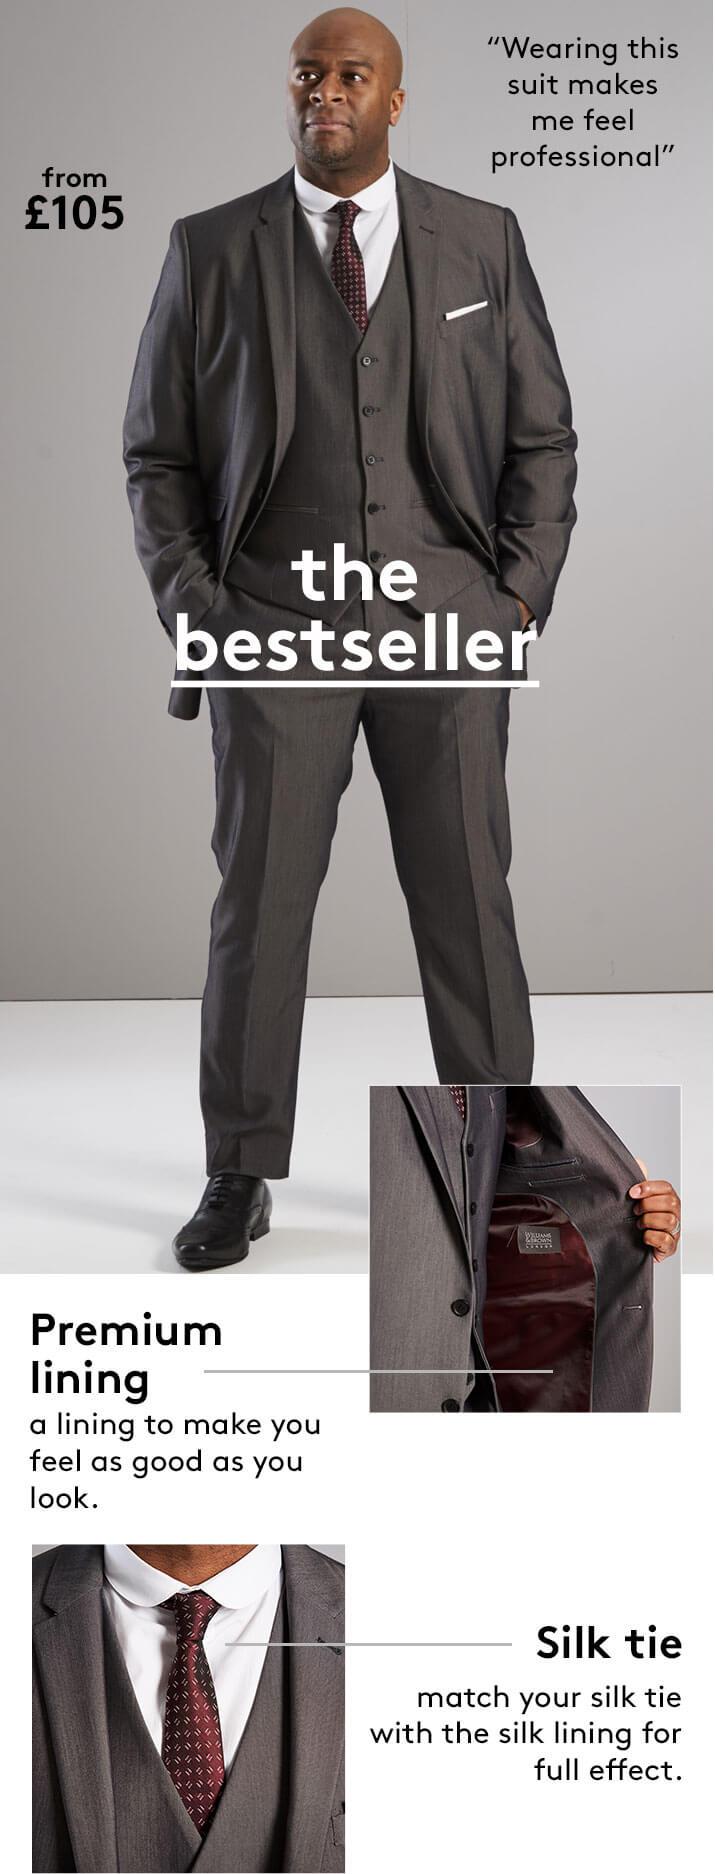 The Bestseller suit